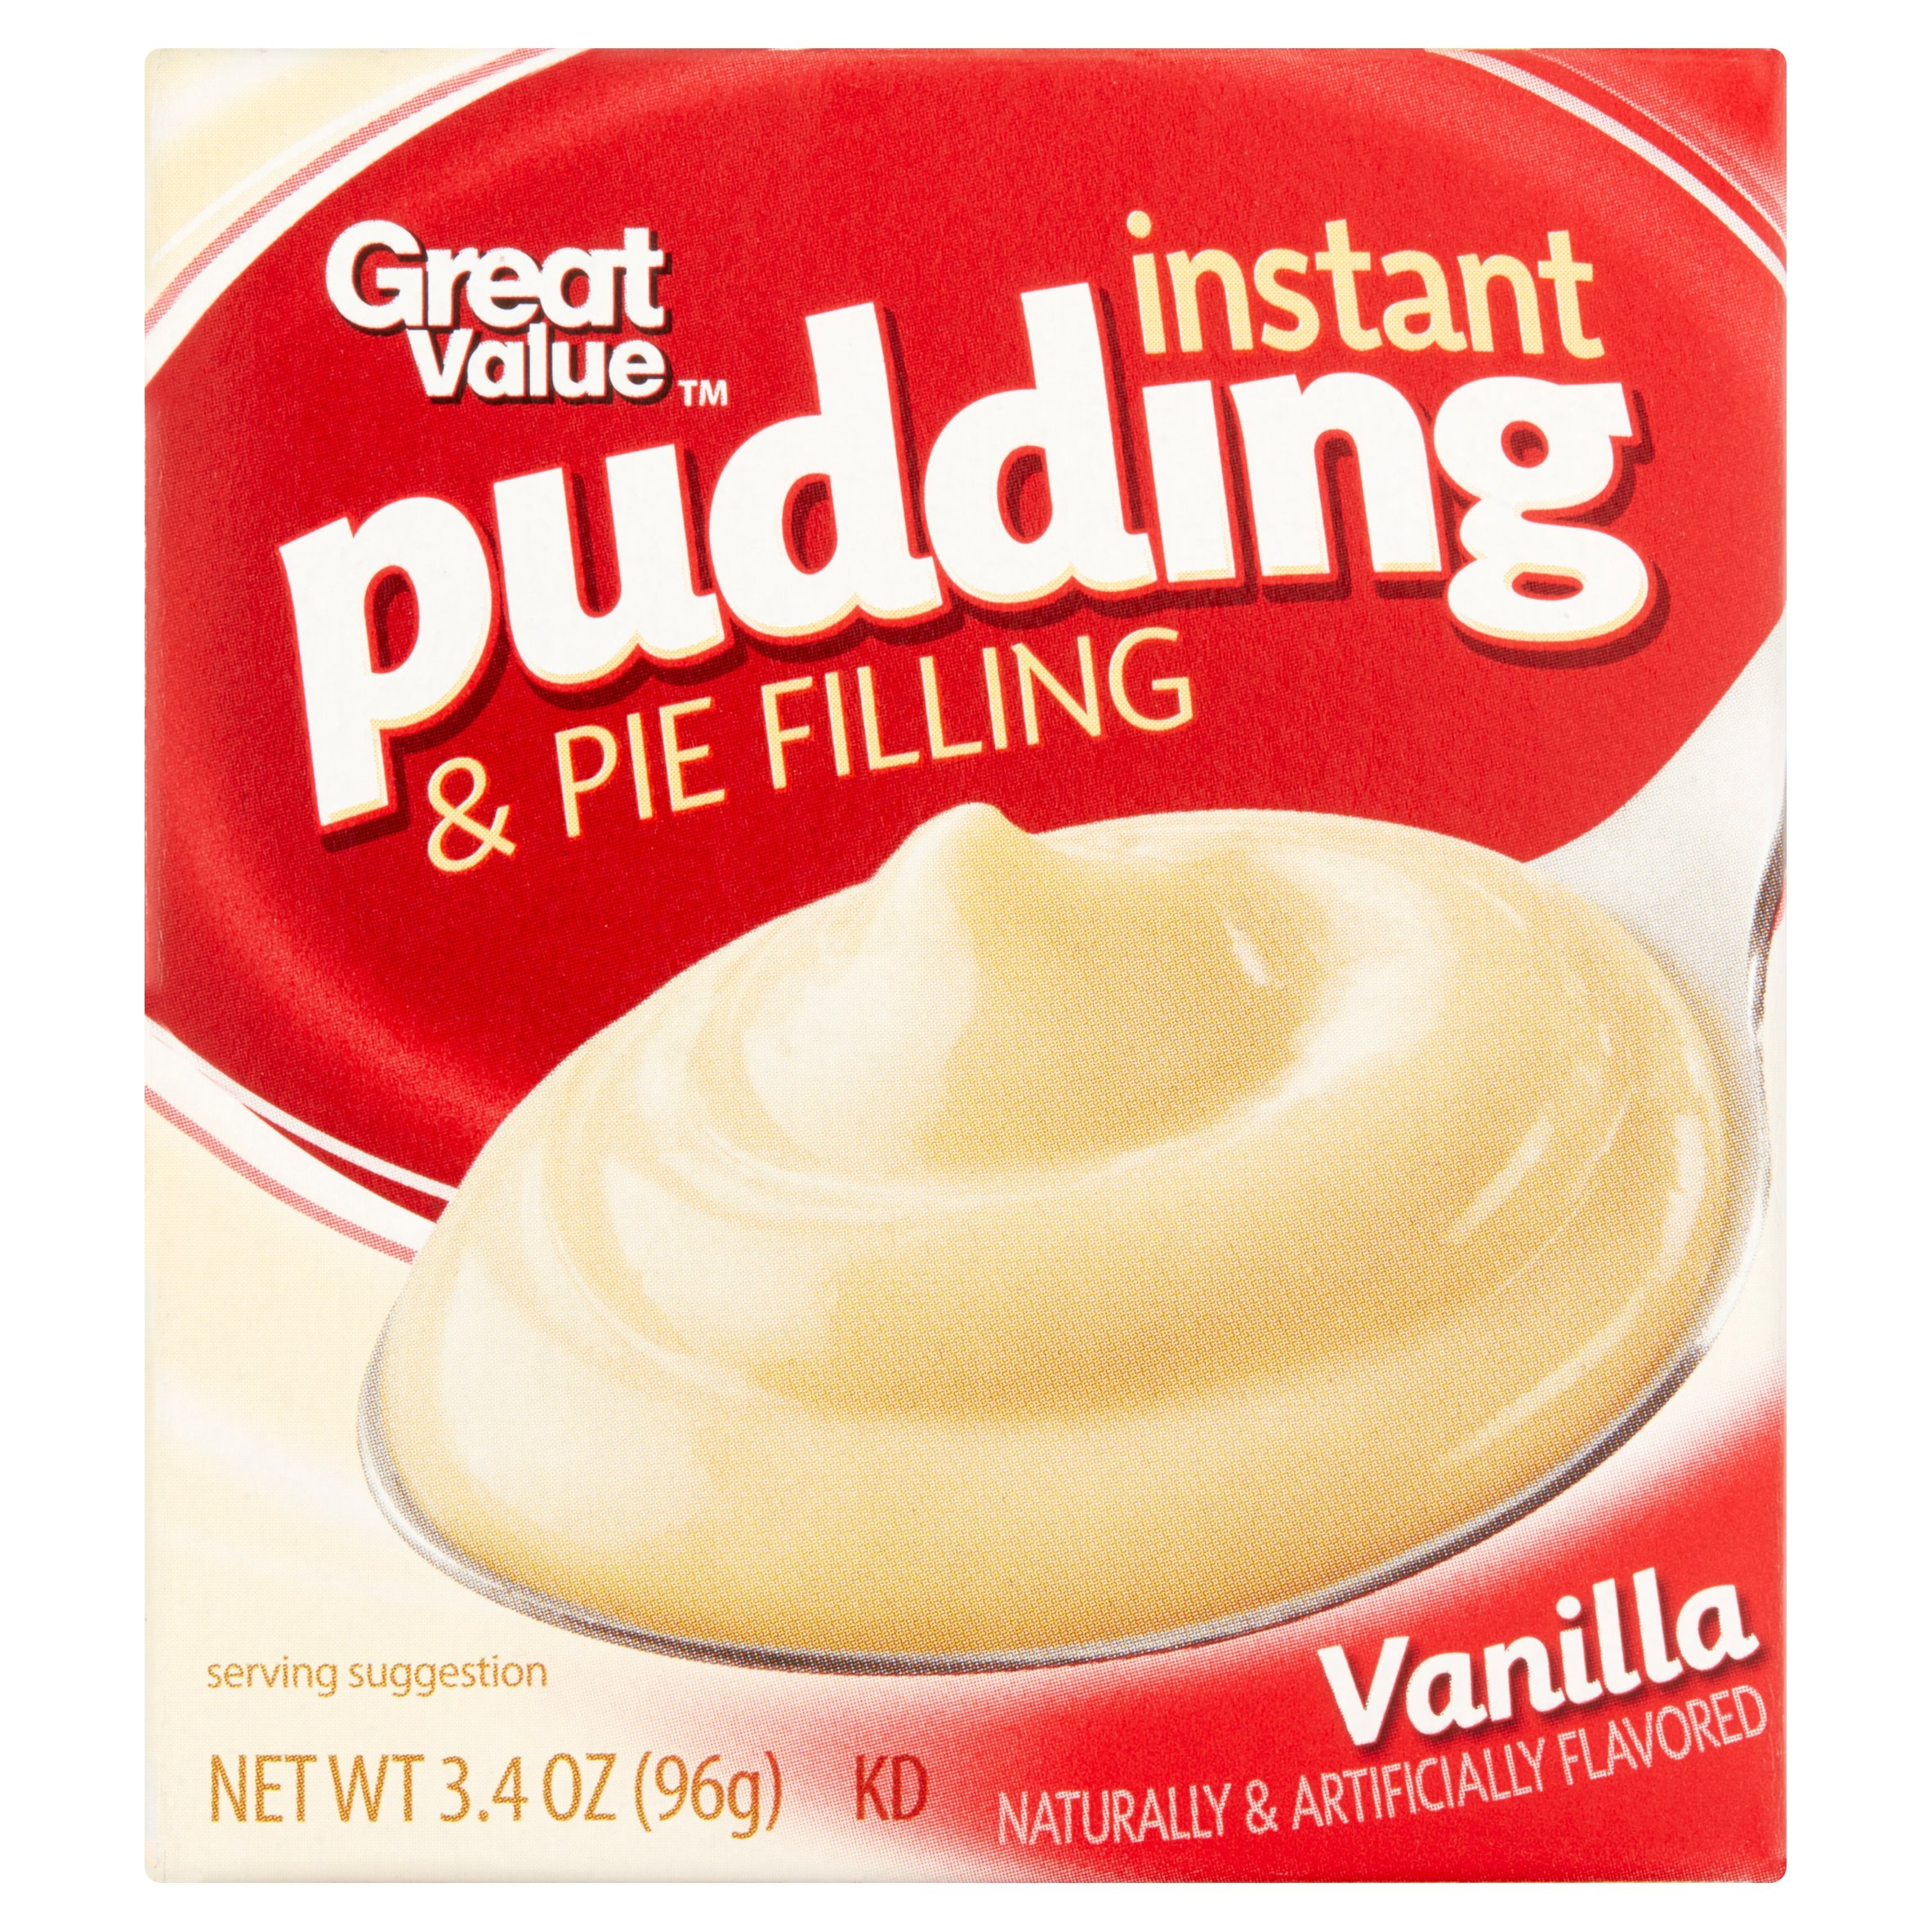 Great Value Vanilla Instant Pudding & Pie Filling, 3.4 oz